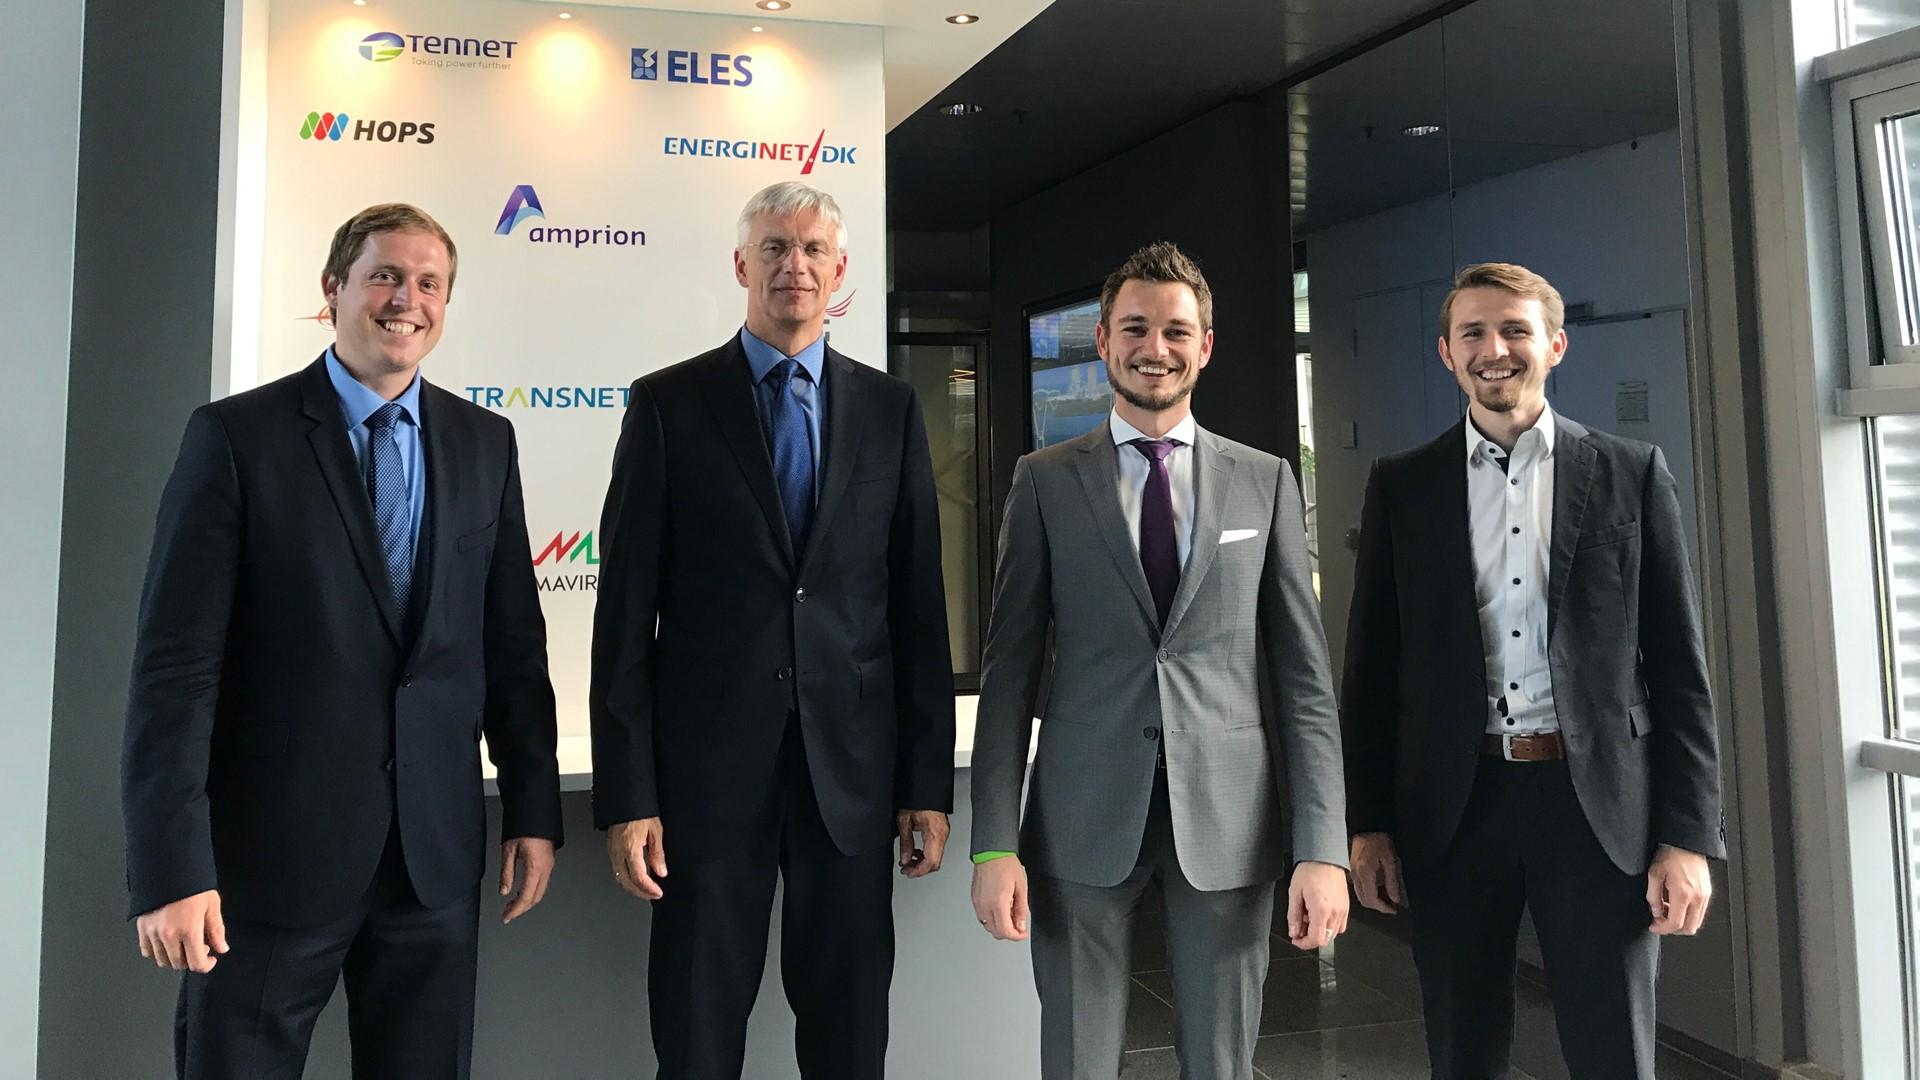 Member of the European Parliament visits TSCNET